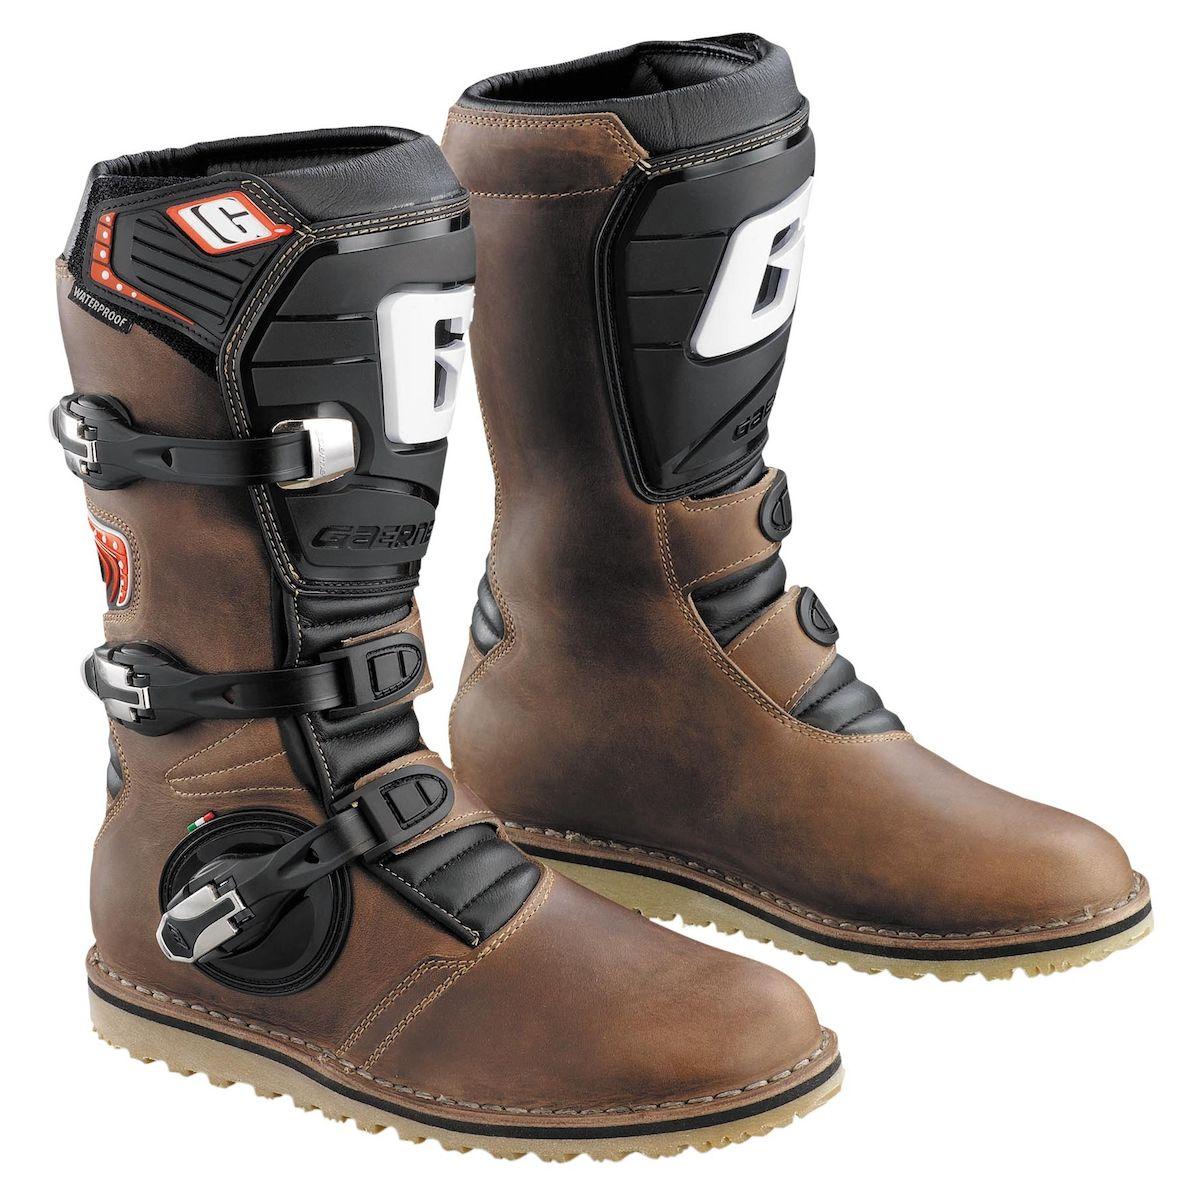 GAERNE BALANCE OILED Brown Leather Waterproof Boots Sz EU44